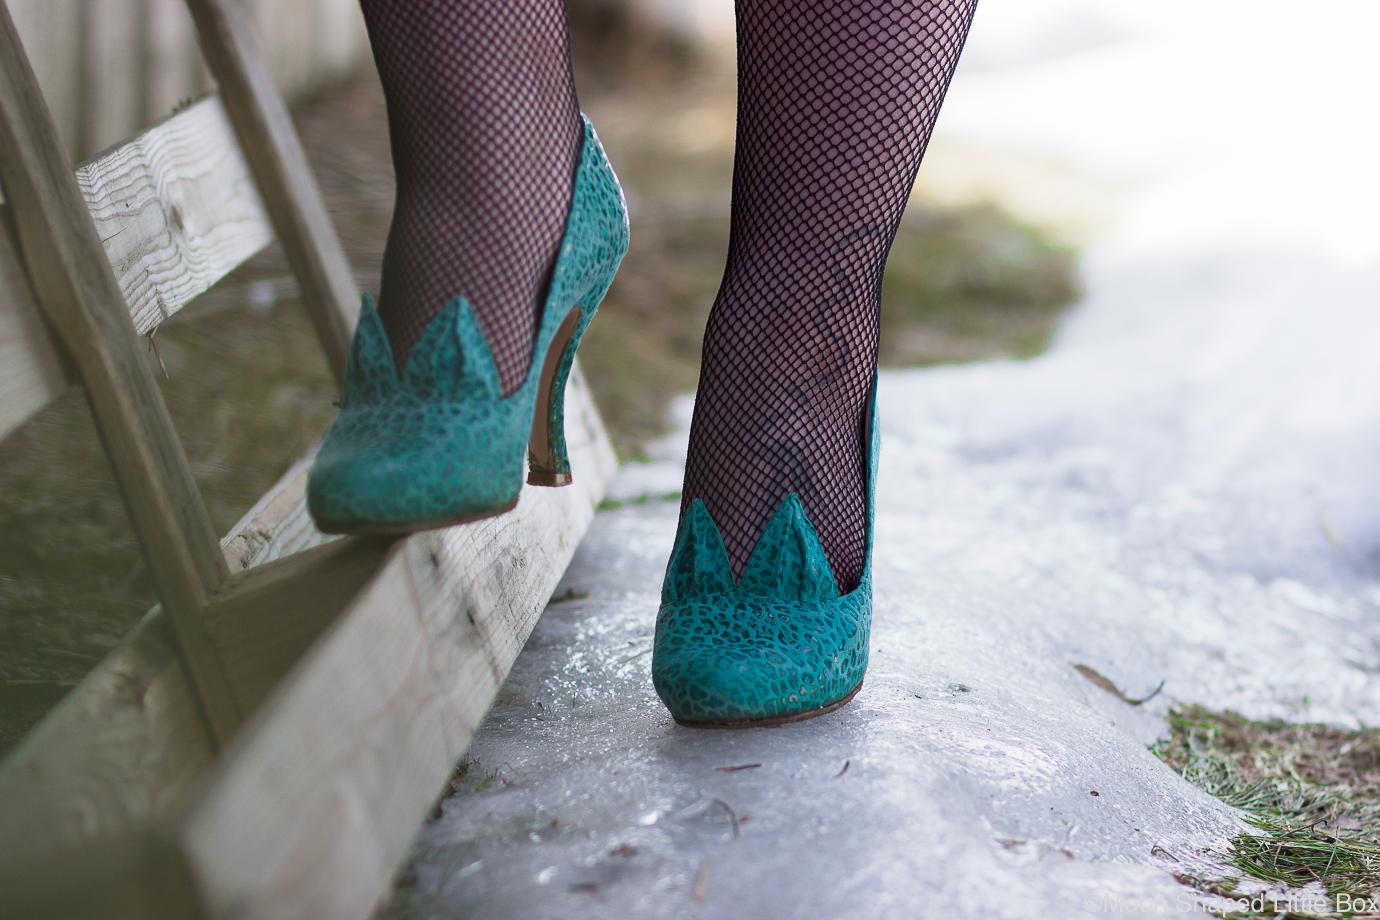 Paivan-asu-kengat